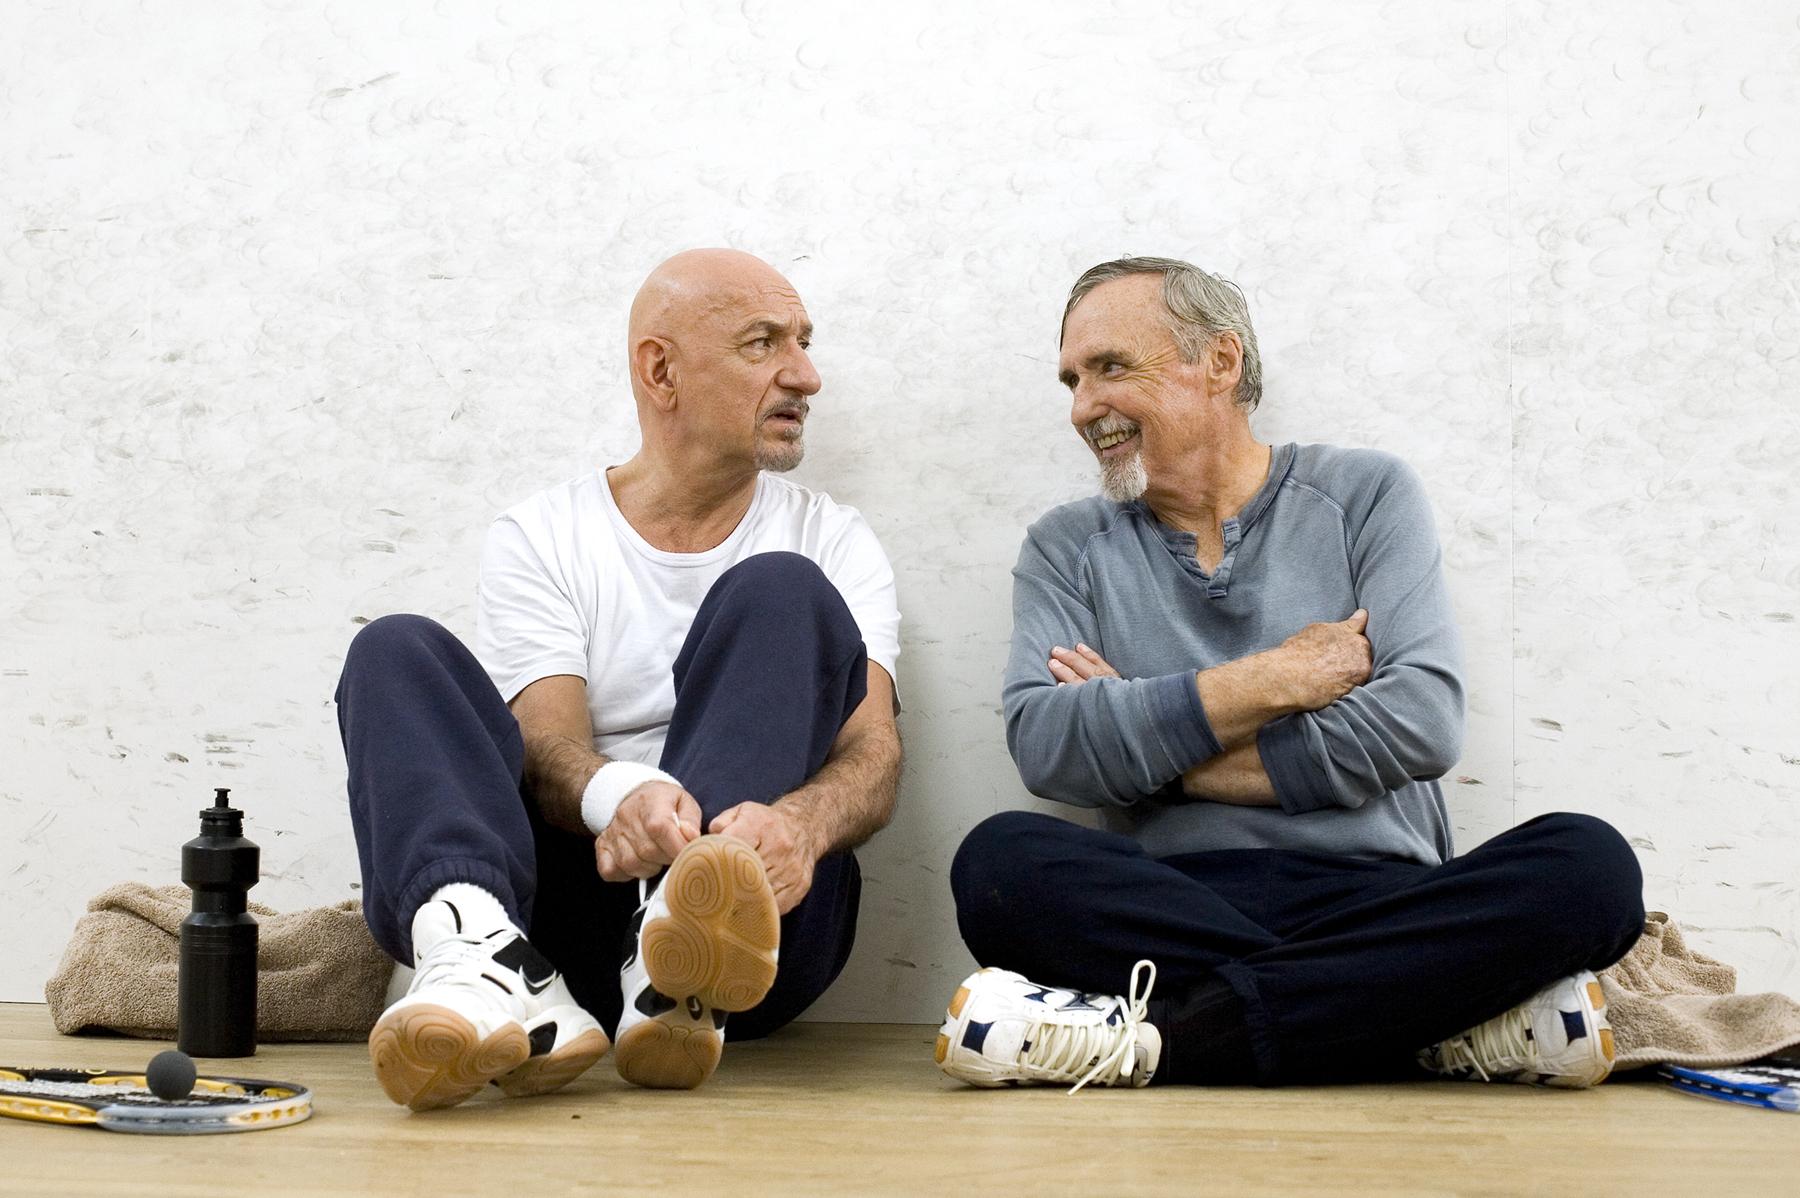 Dennis Hopper and Ben Kingsley in Elegy (2008)